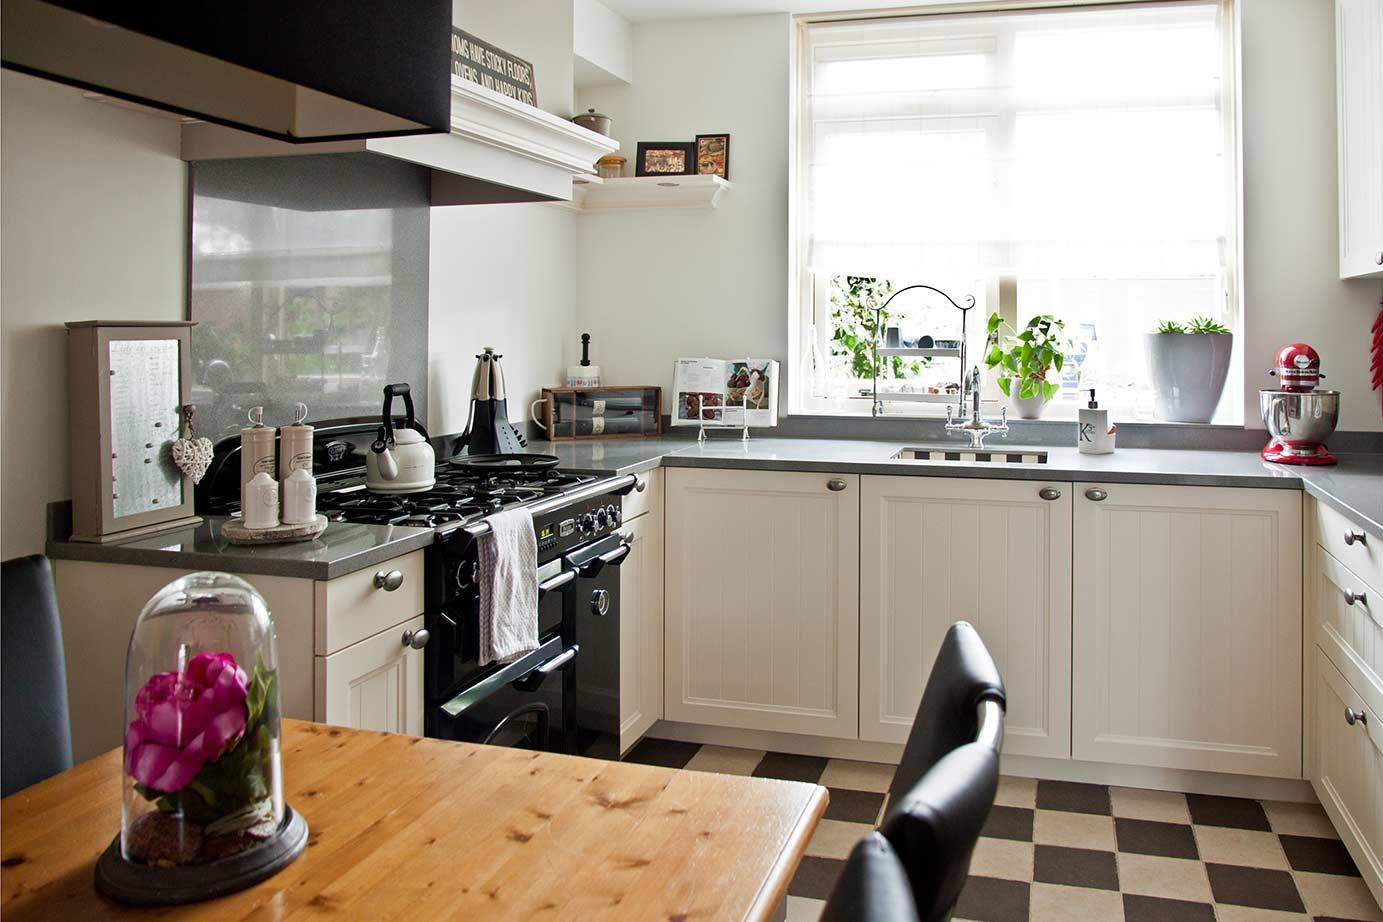 Zwart Keuken Stoere : Ardi keukens en sanitair dé keukenspecialist van zeeland ardi